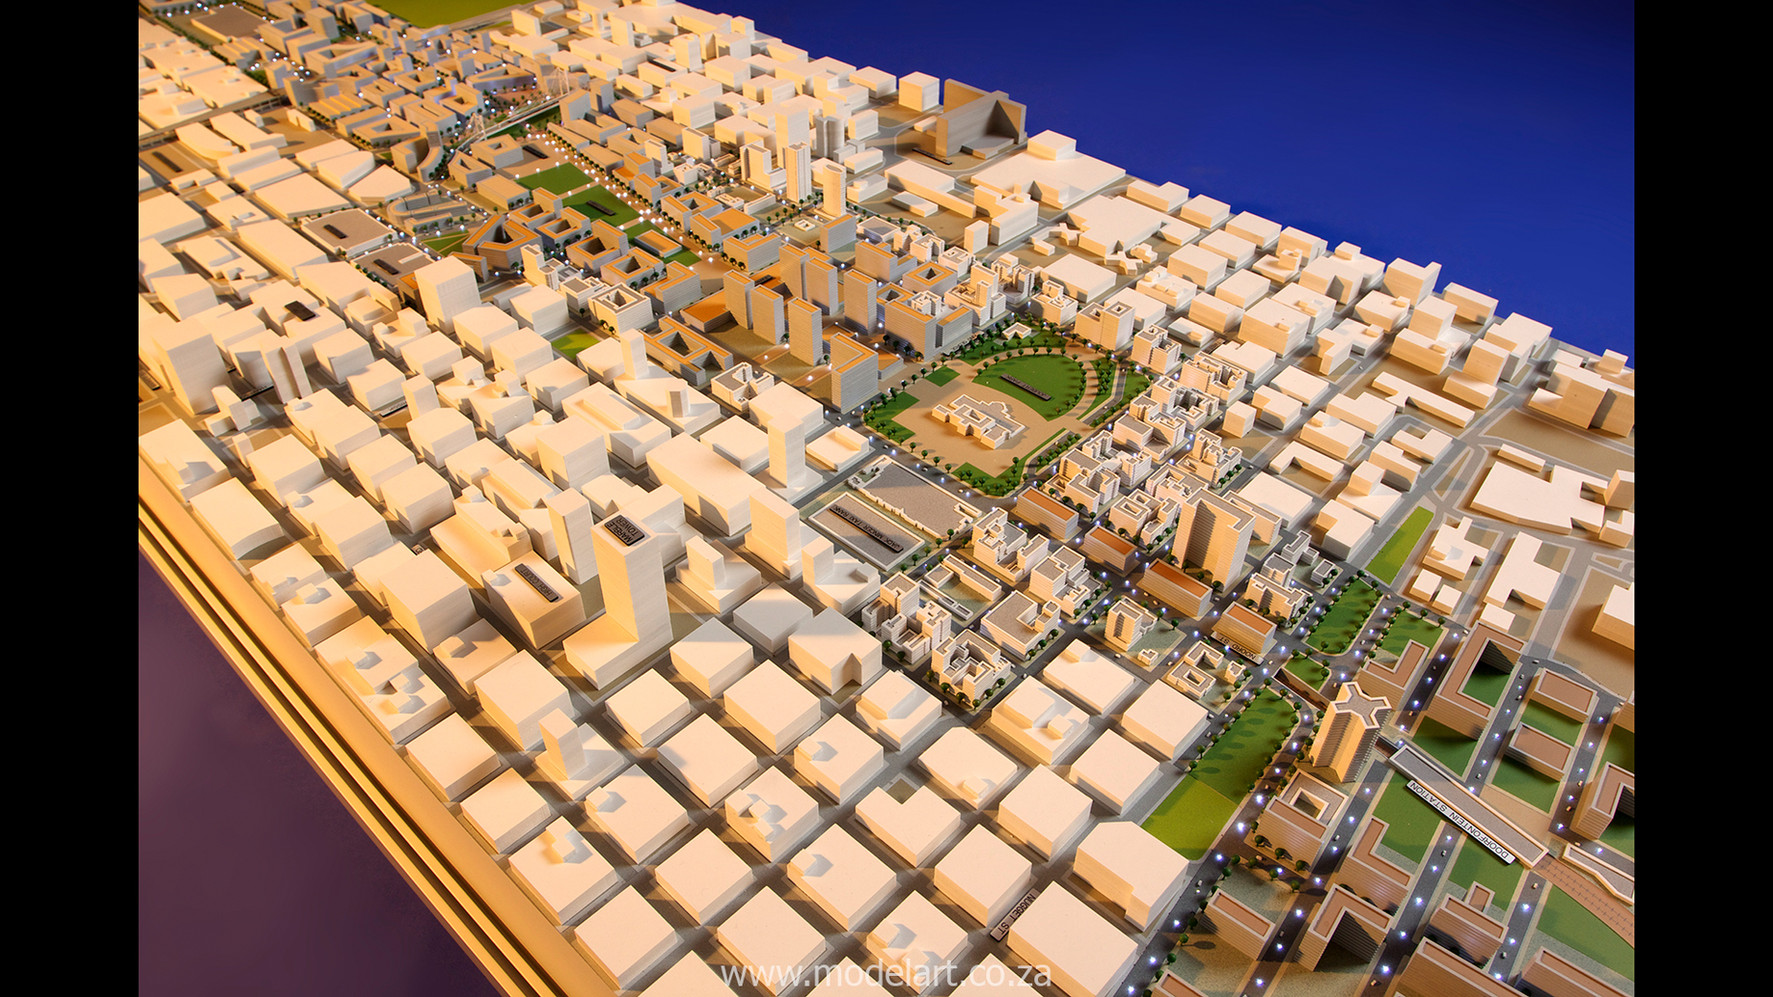 Architect Model-City-CBD-Johannesburg5